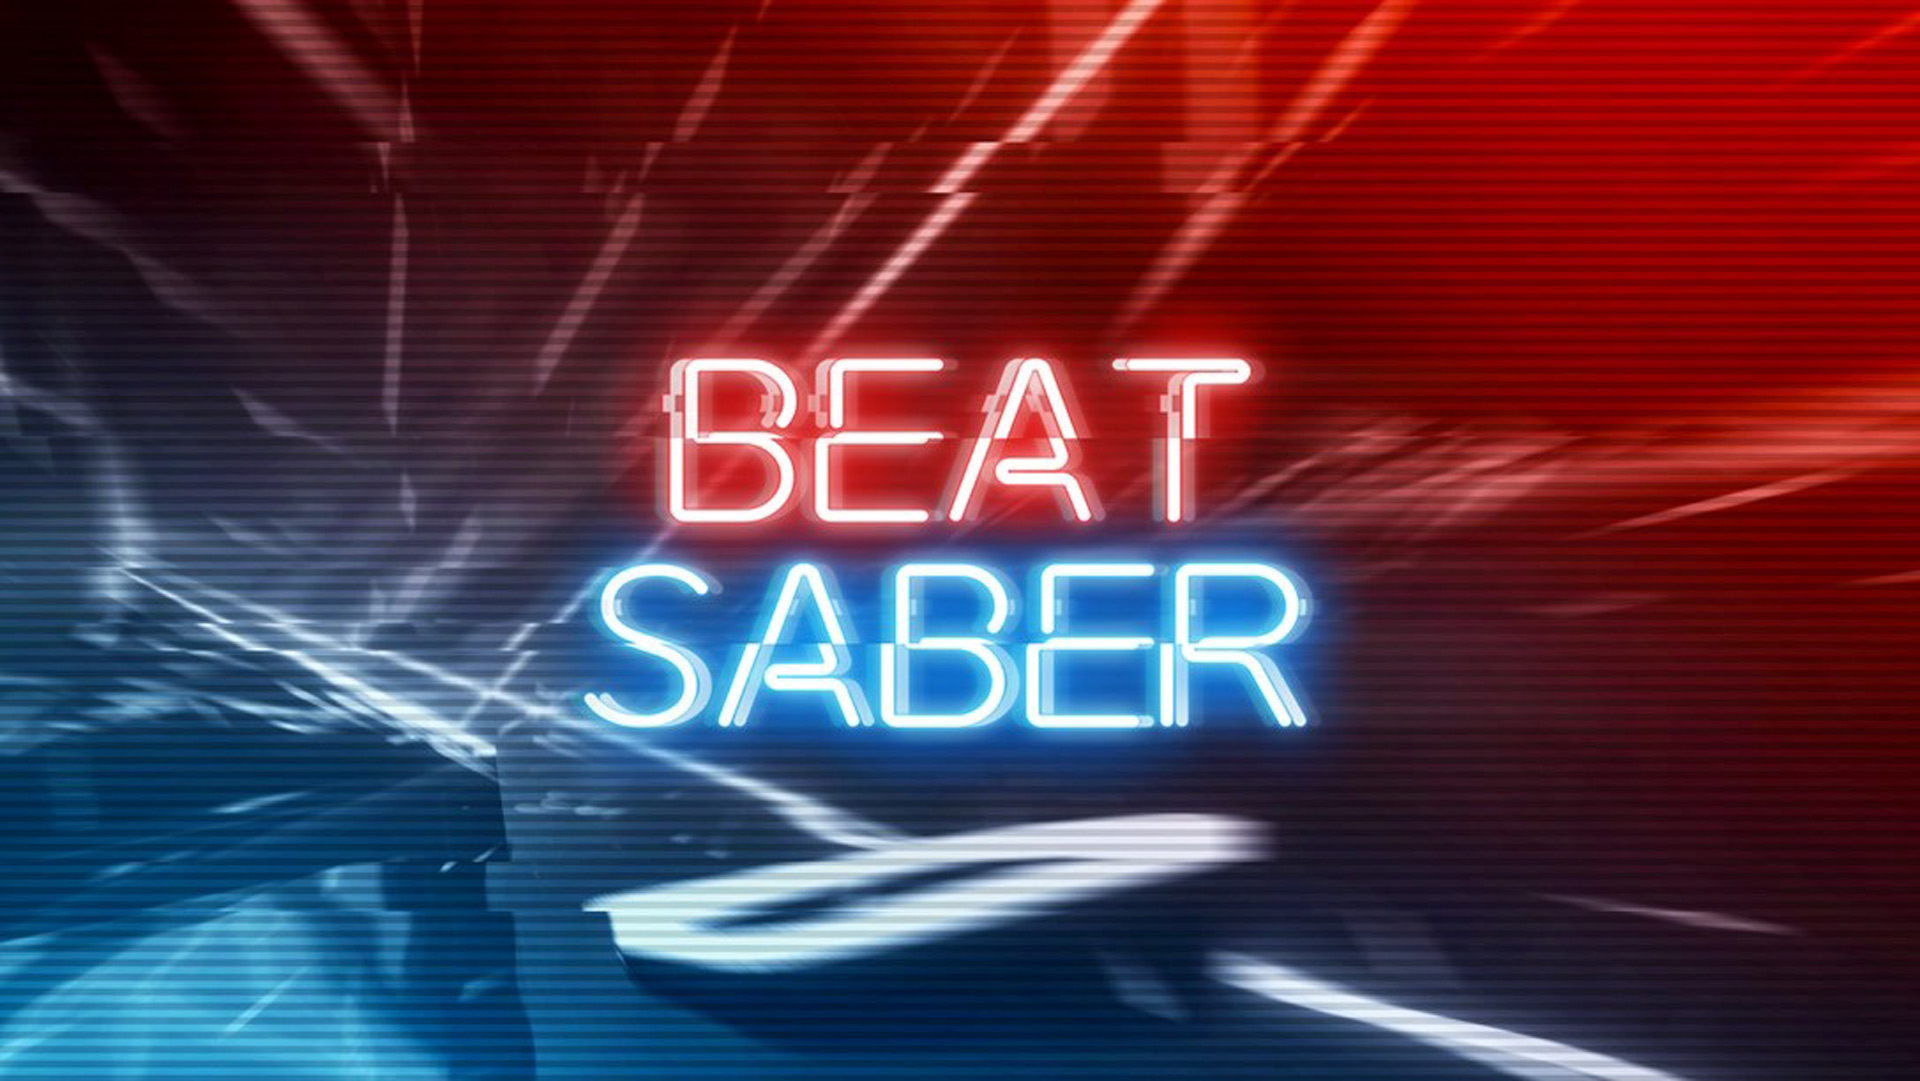 beat saber vr - Beat Saber VR Has Got New 360 Degree Mode - Watch Video